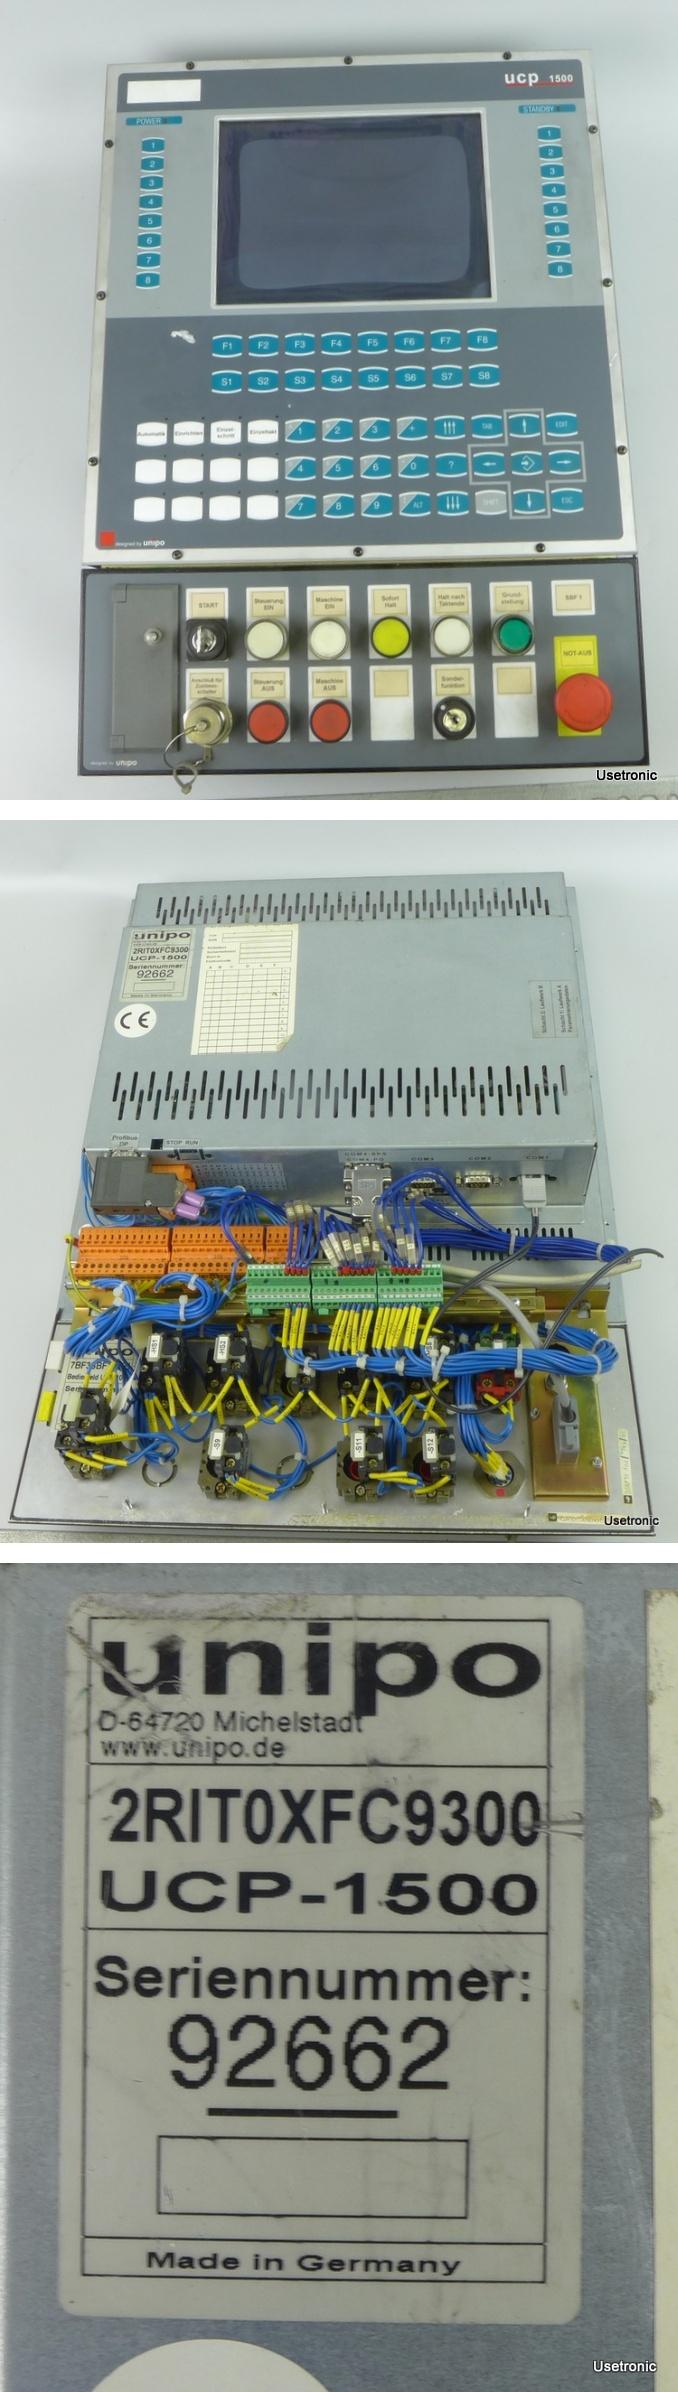 Unipo Panel UCP-1500 2RIT0XFC9300